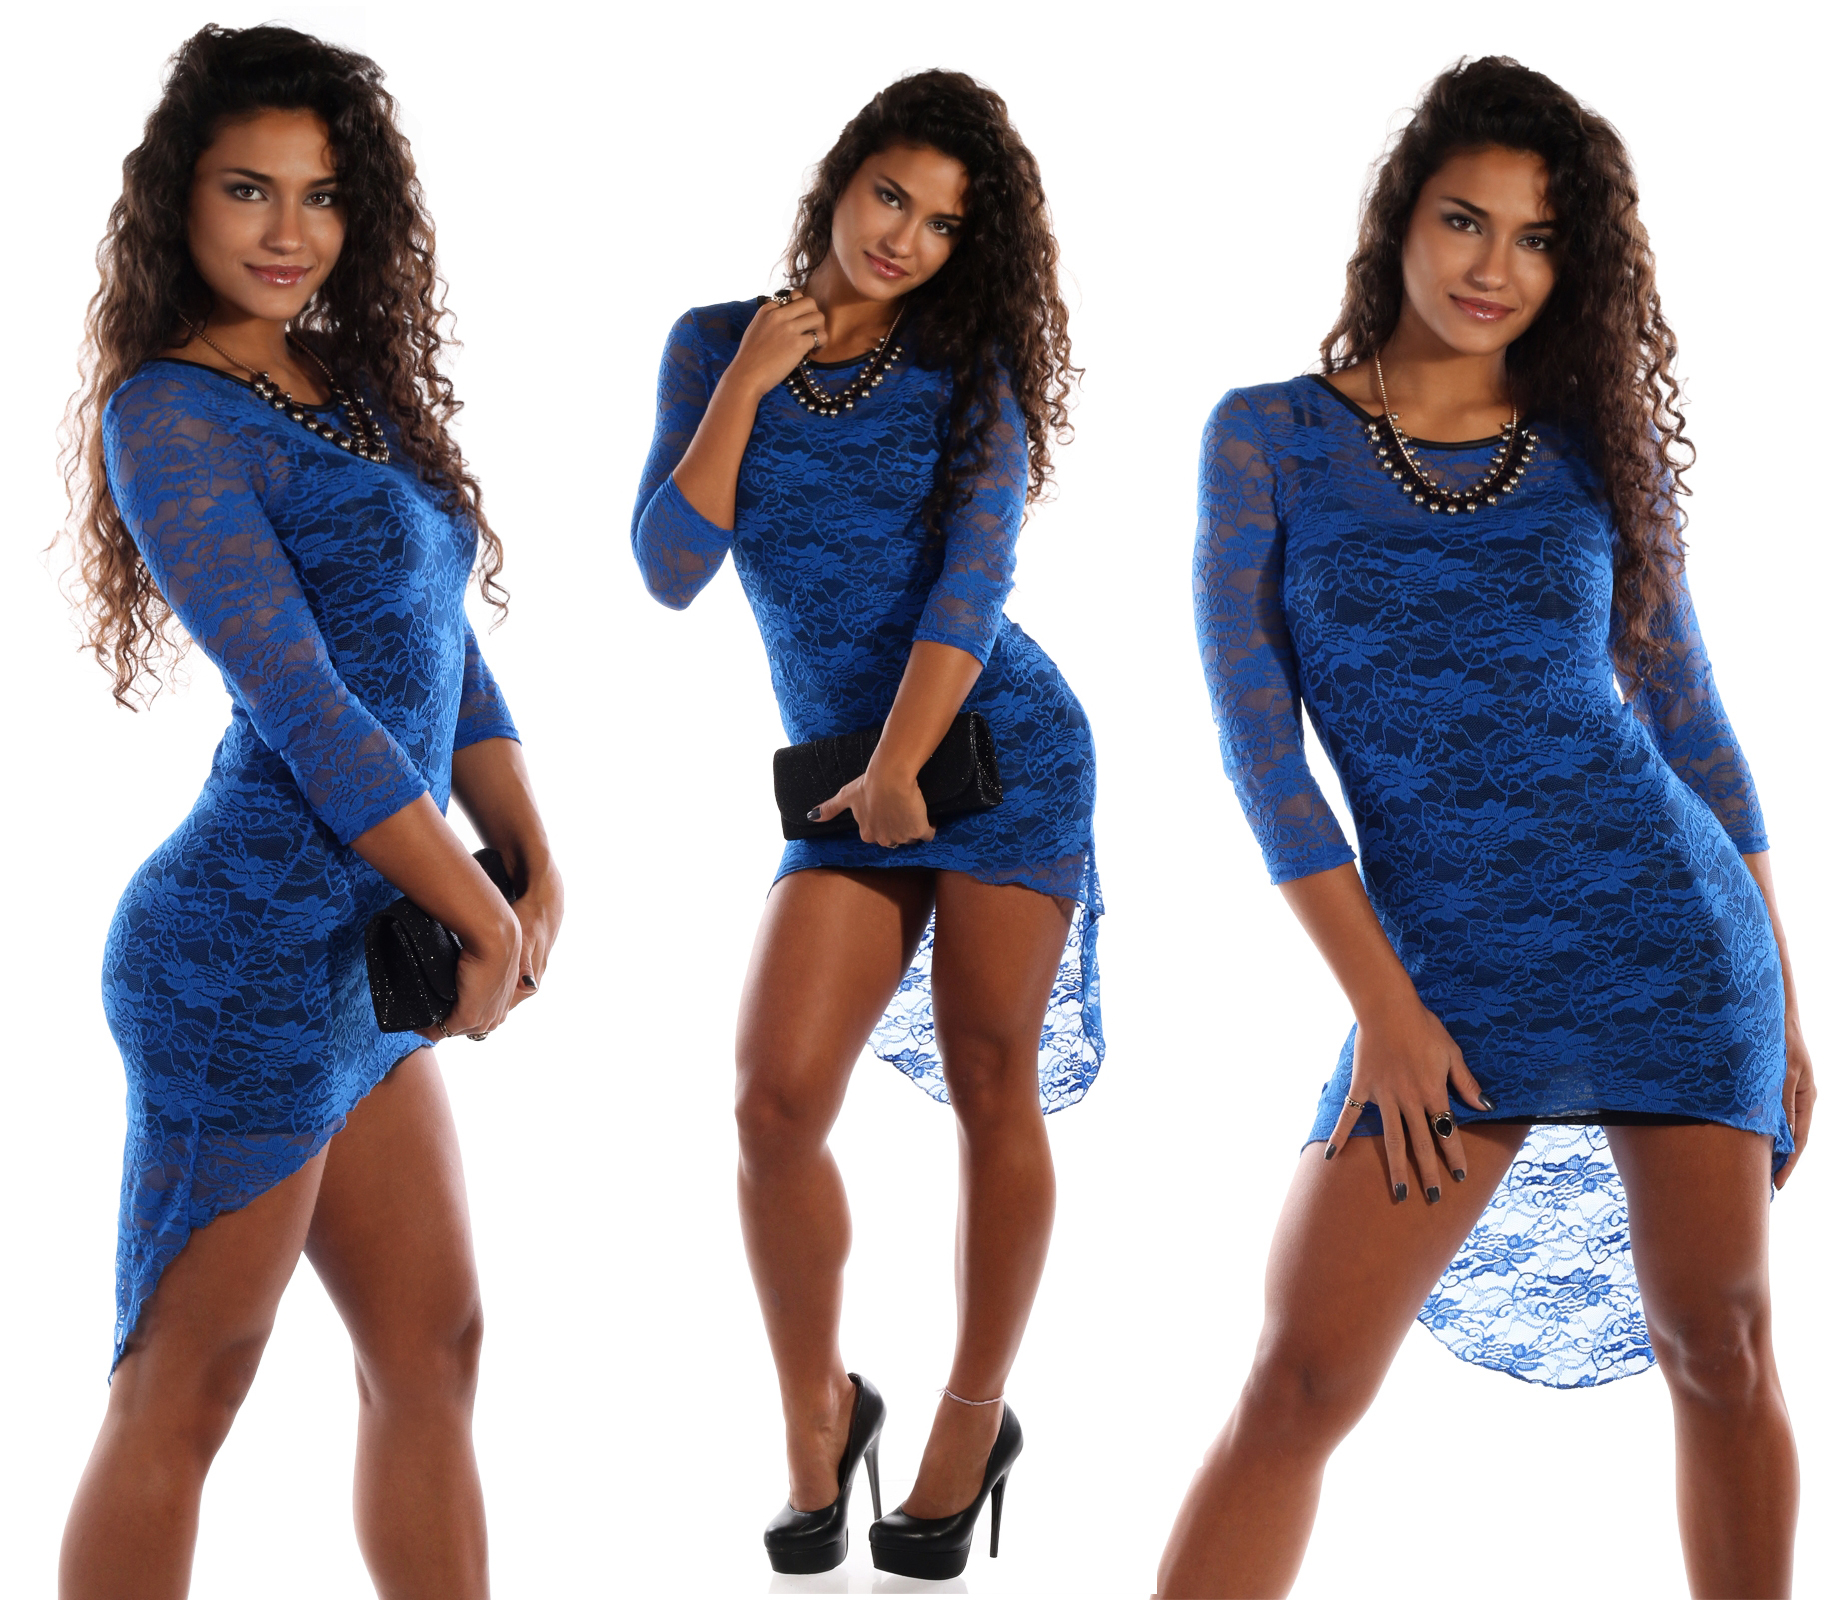 minikleid vorne kurz hinten lang spitzenoptik blau - mode